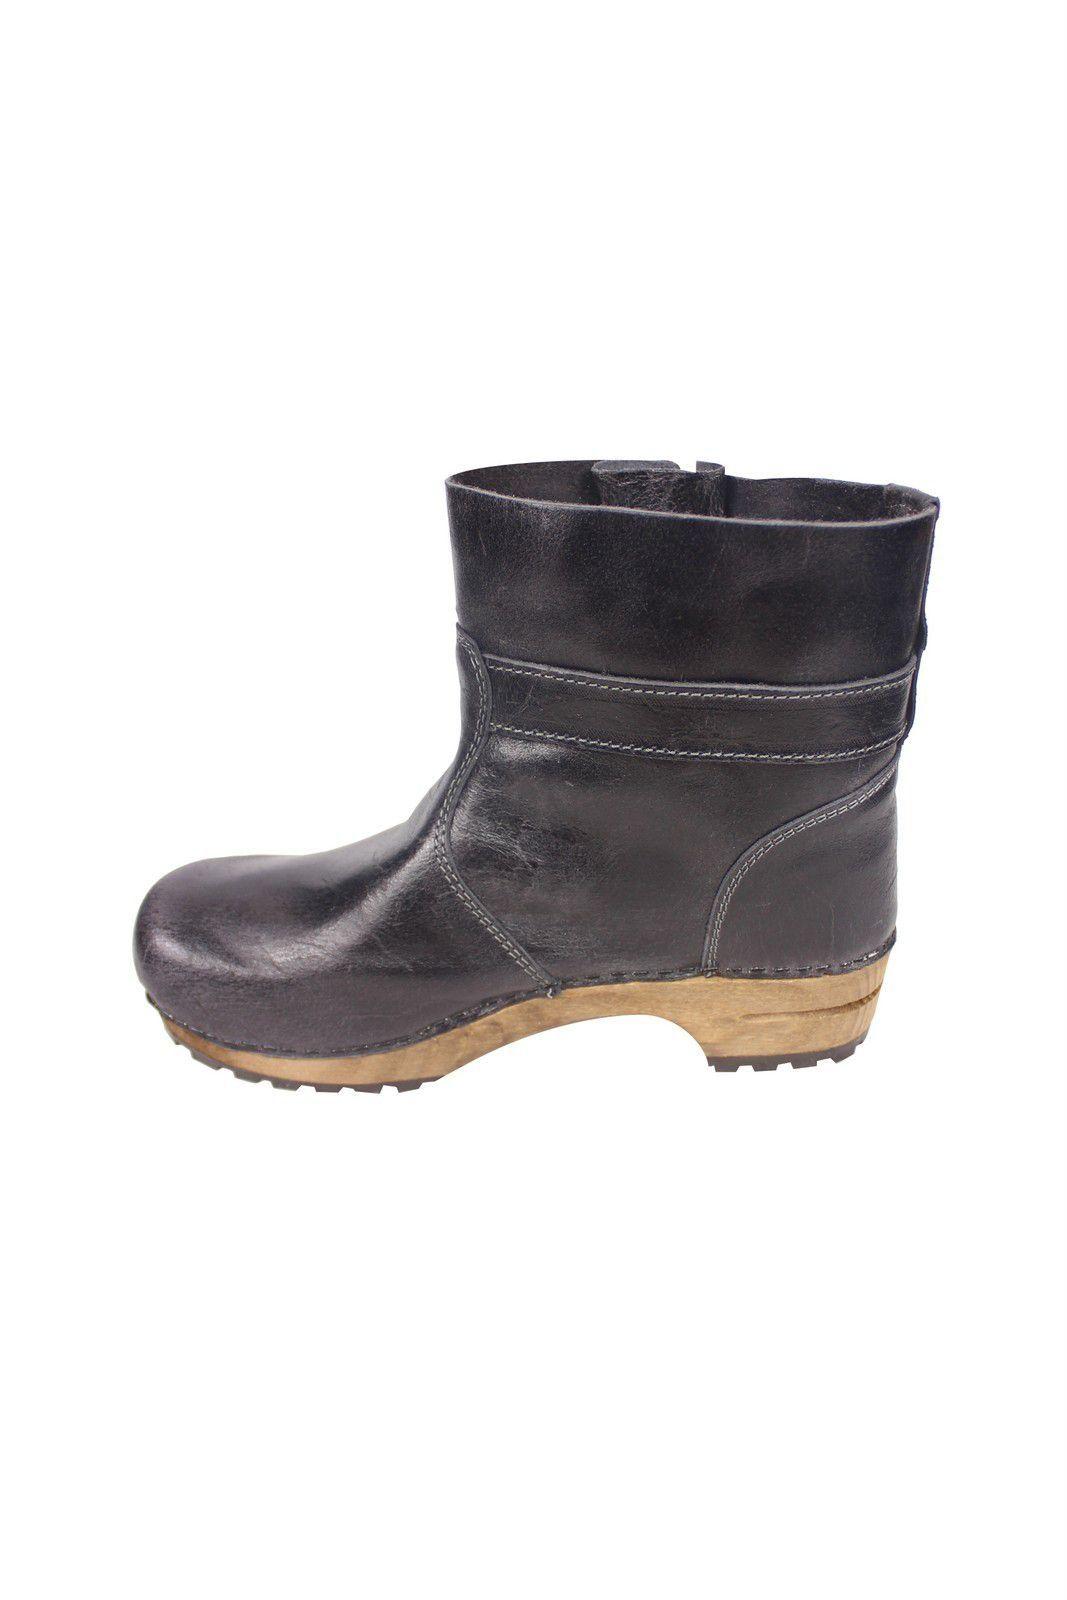 Sanita Mina Low Classic Clog Boot Black 452330 Rev Side 2